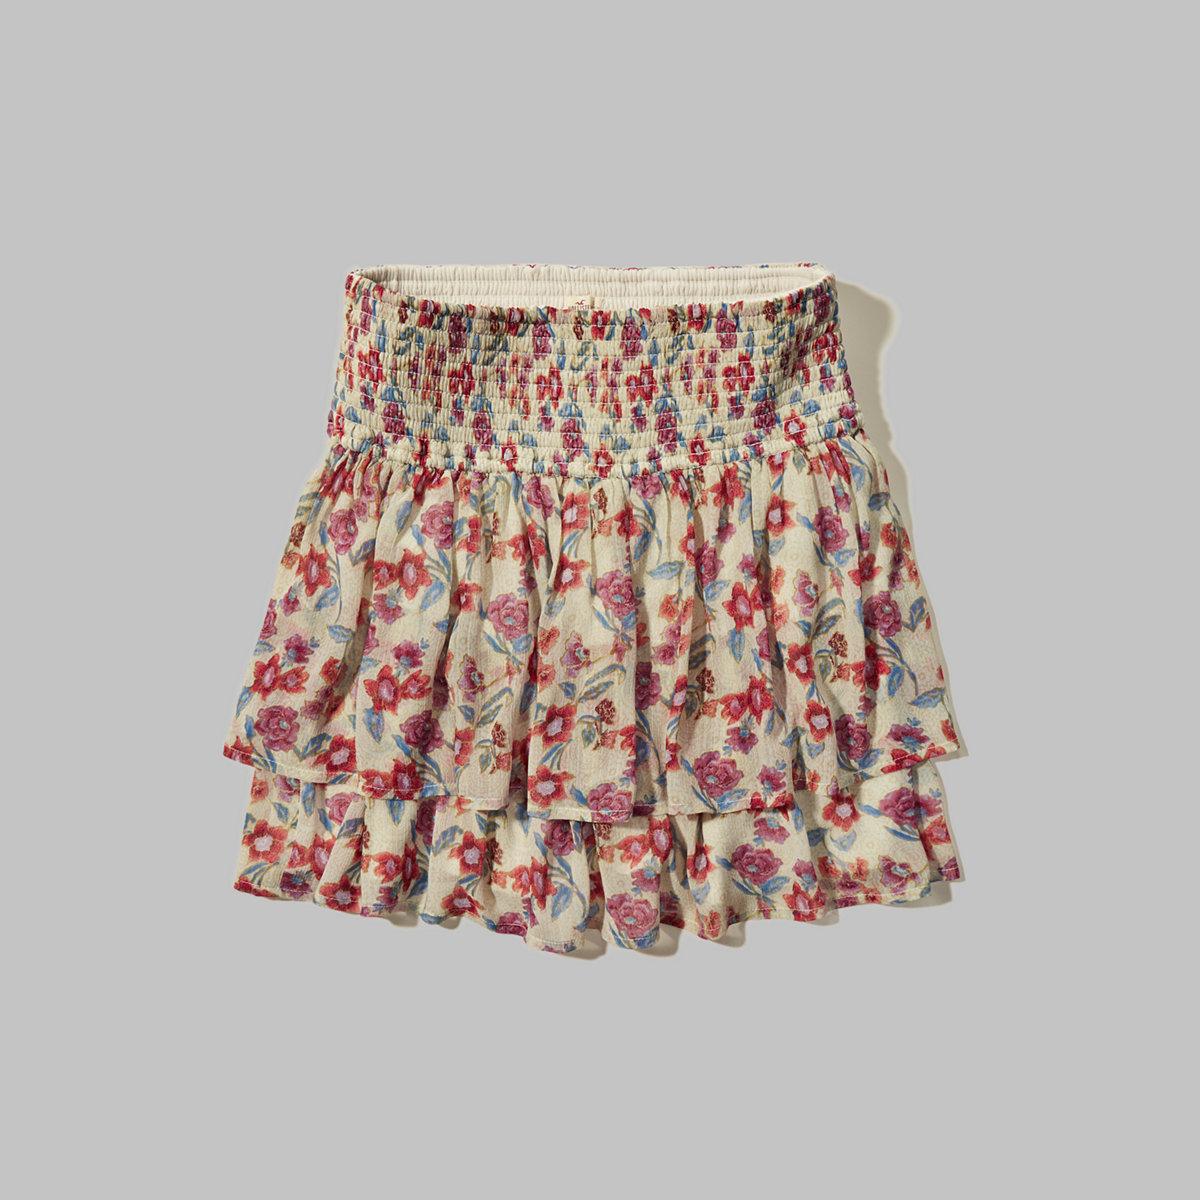 Tiered Smocked-Waist Skirt